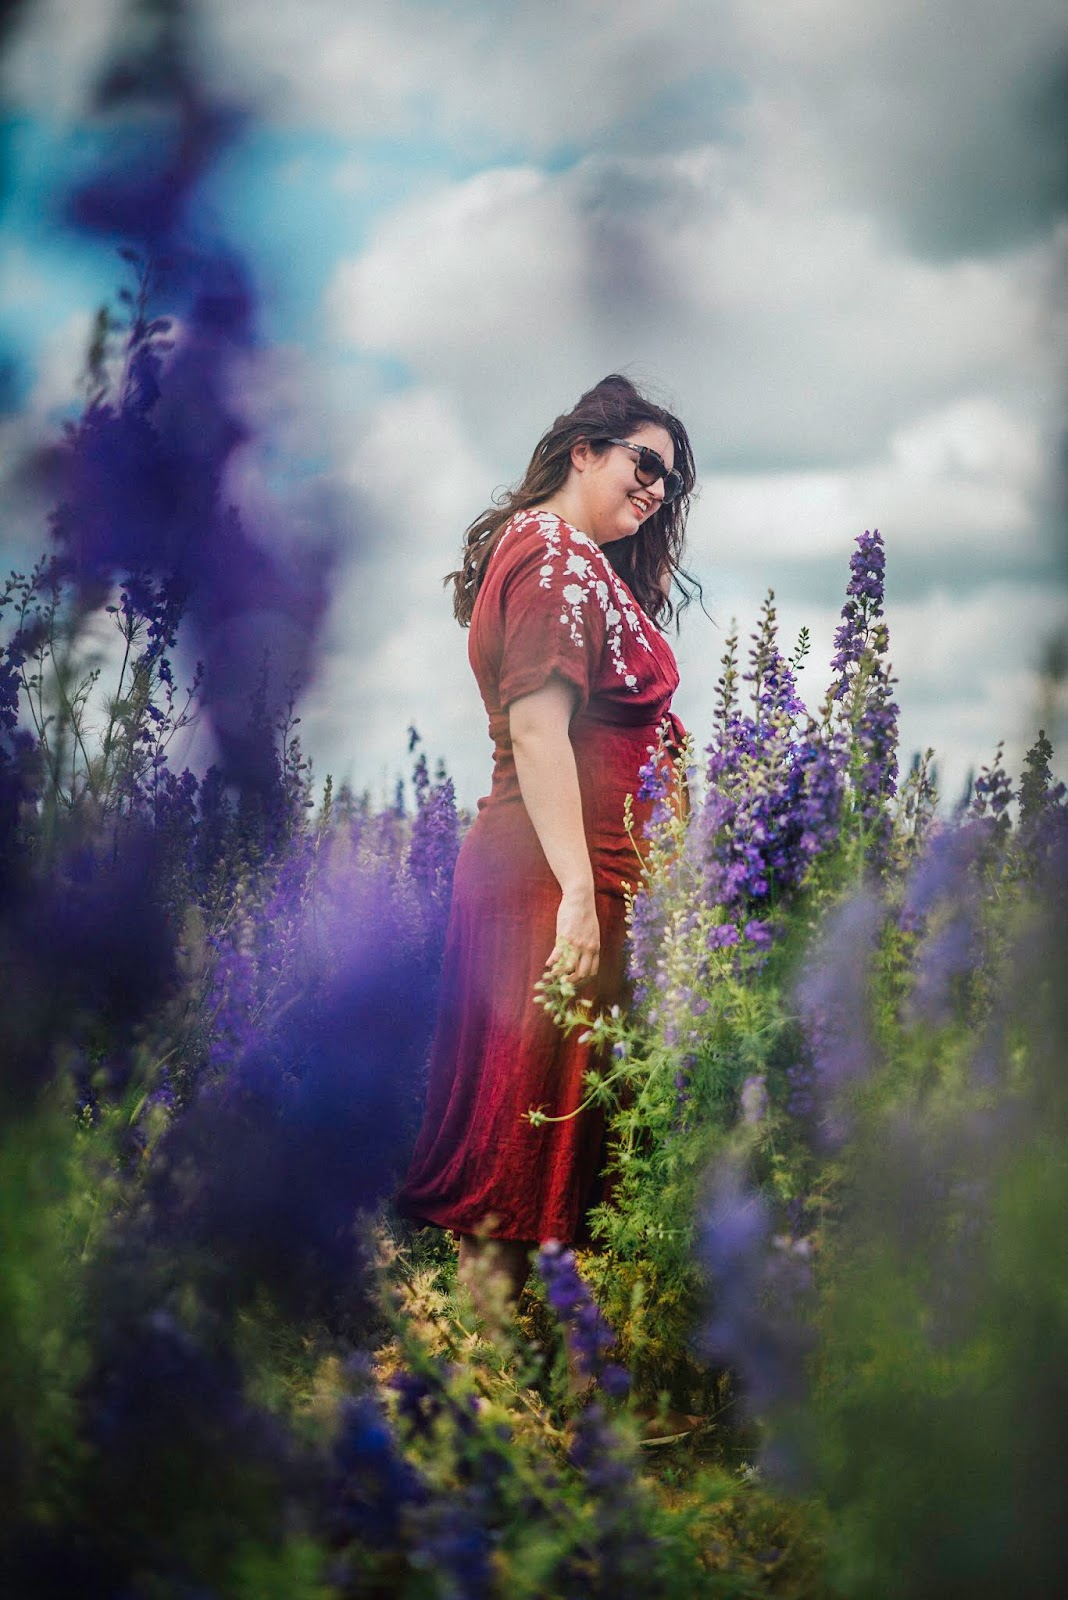 confetti flower field photography tips how to liquid grain liquidgrain